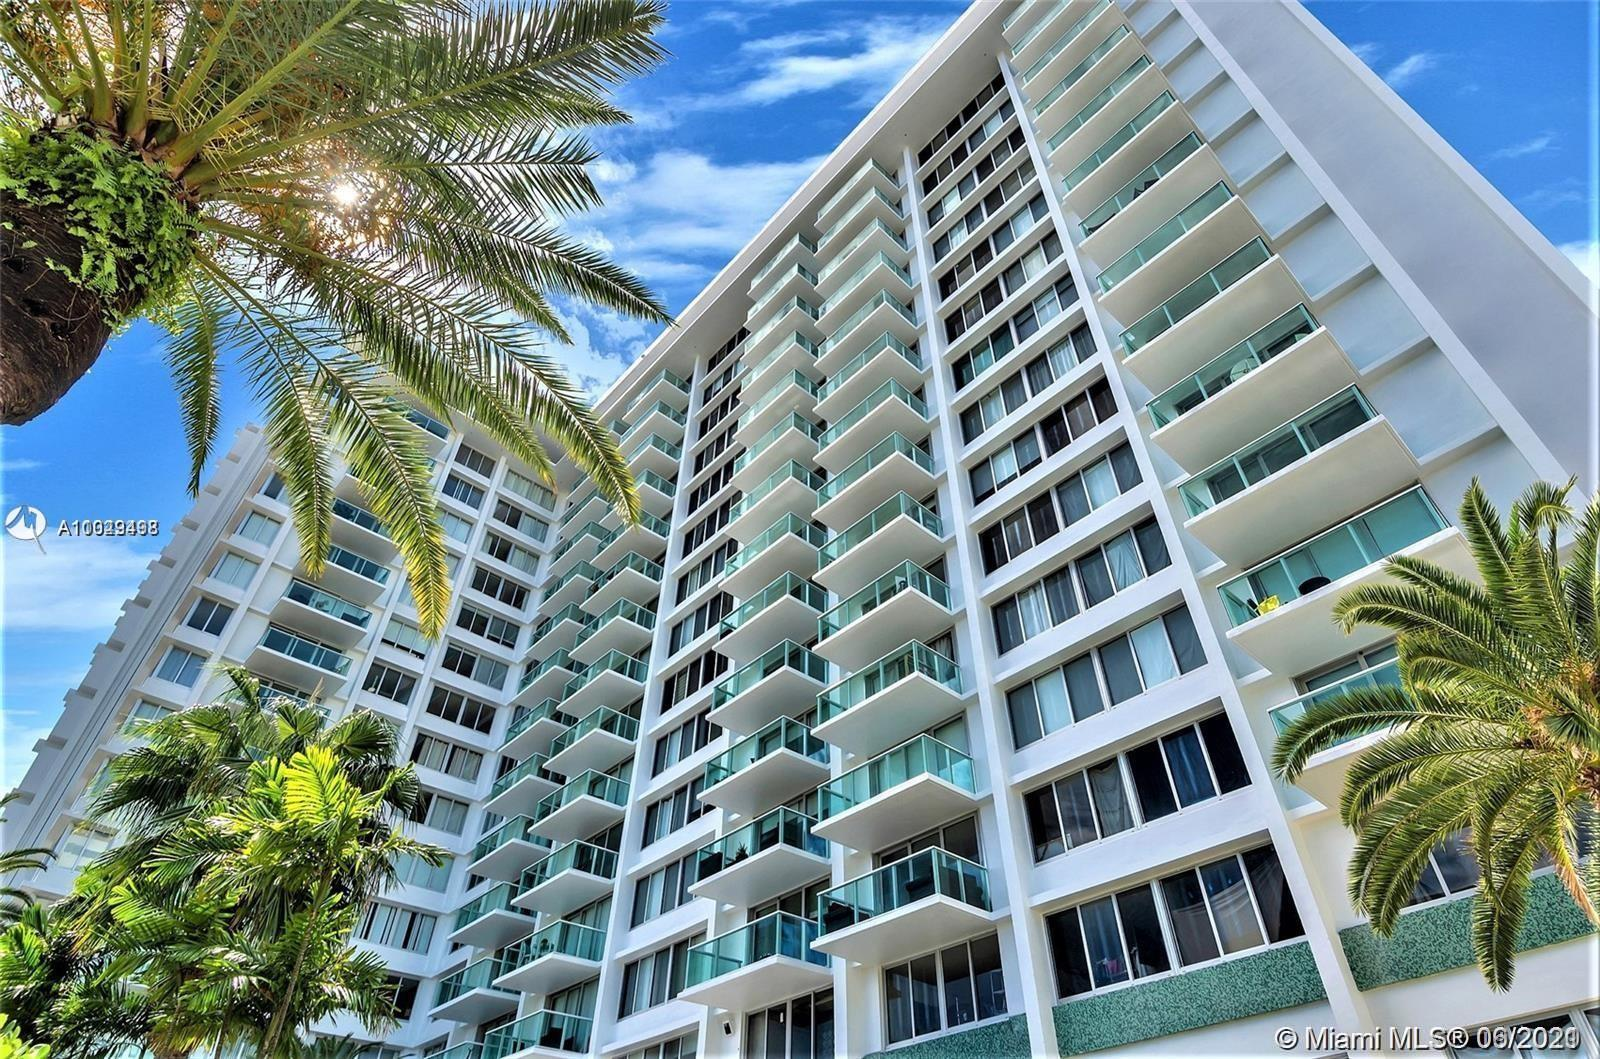 Mirador South #1119 - 1000 West Ave #1119, Miami Beach, FL 33139